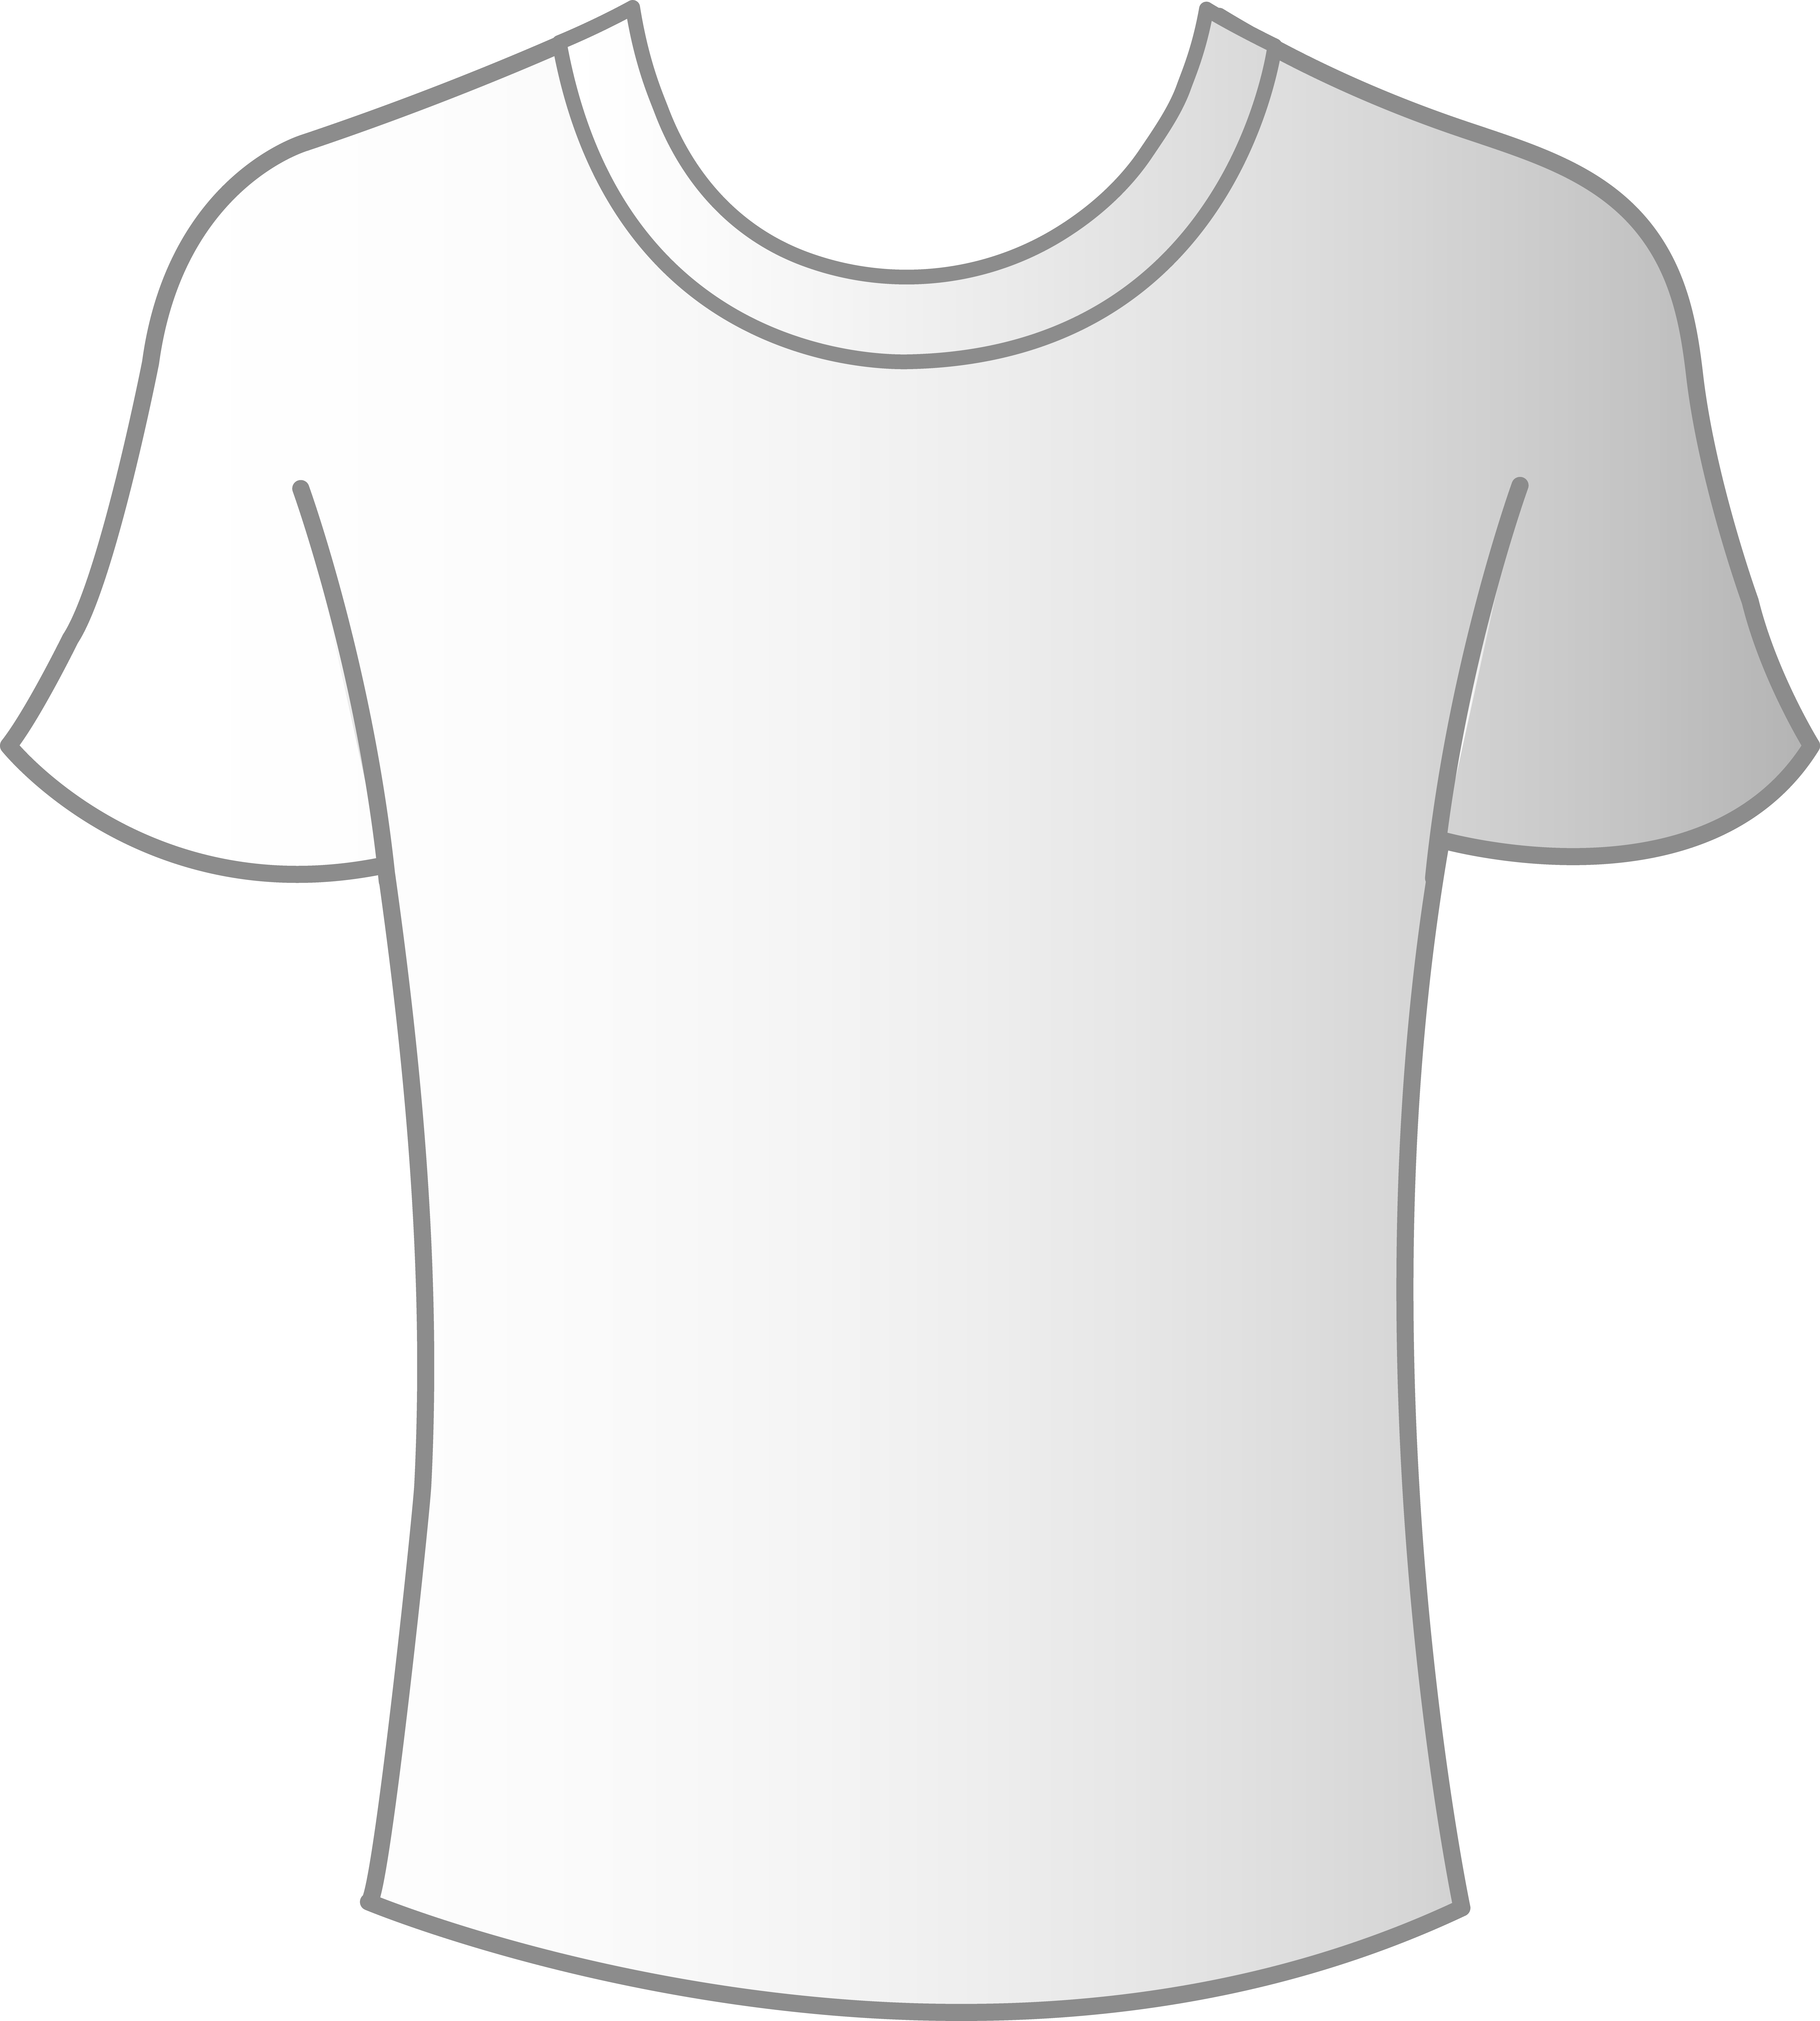 blank t shirt printable clipart best. Black Bedroom Furniture Sets. Home Design Ideas